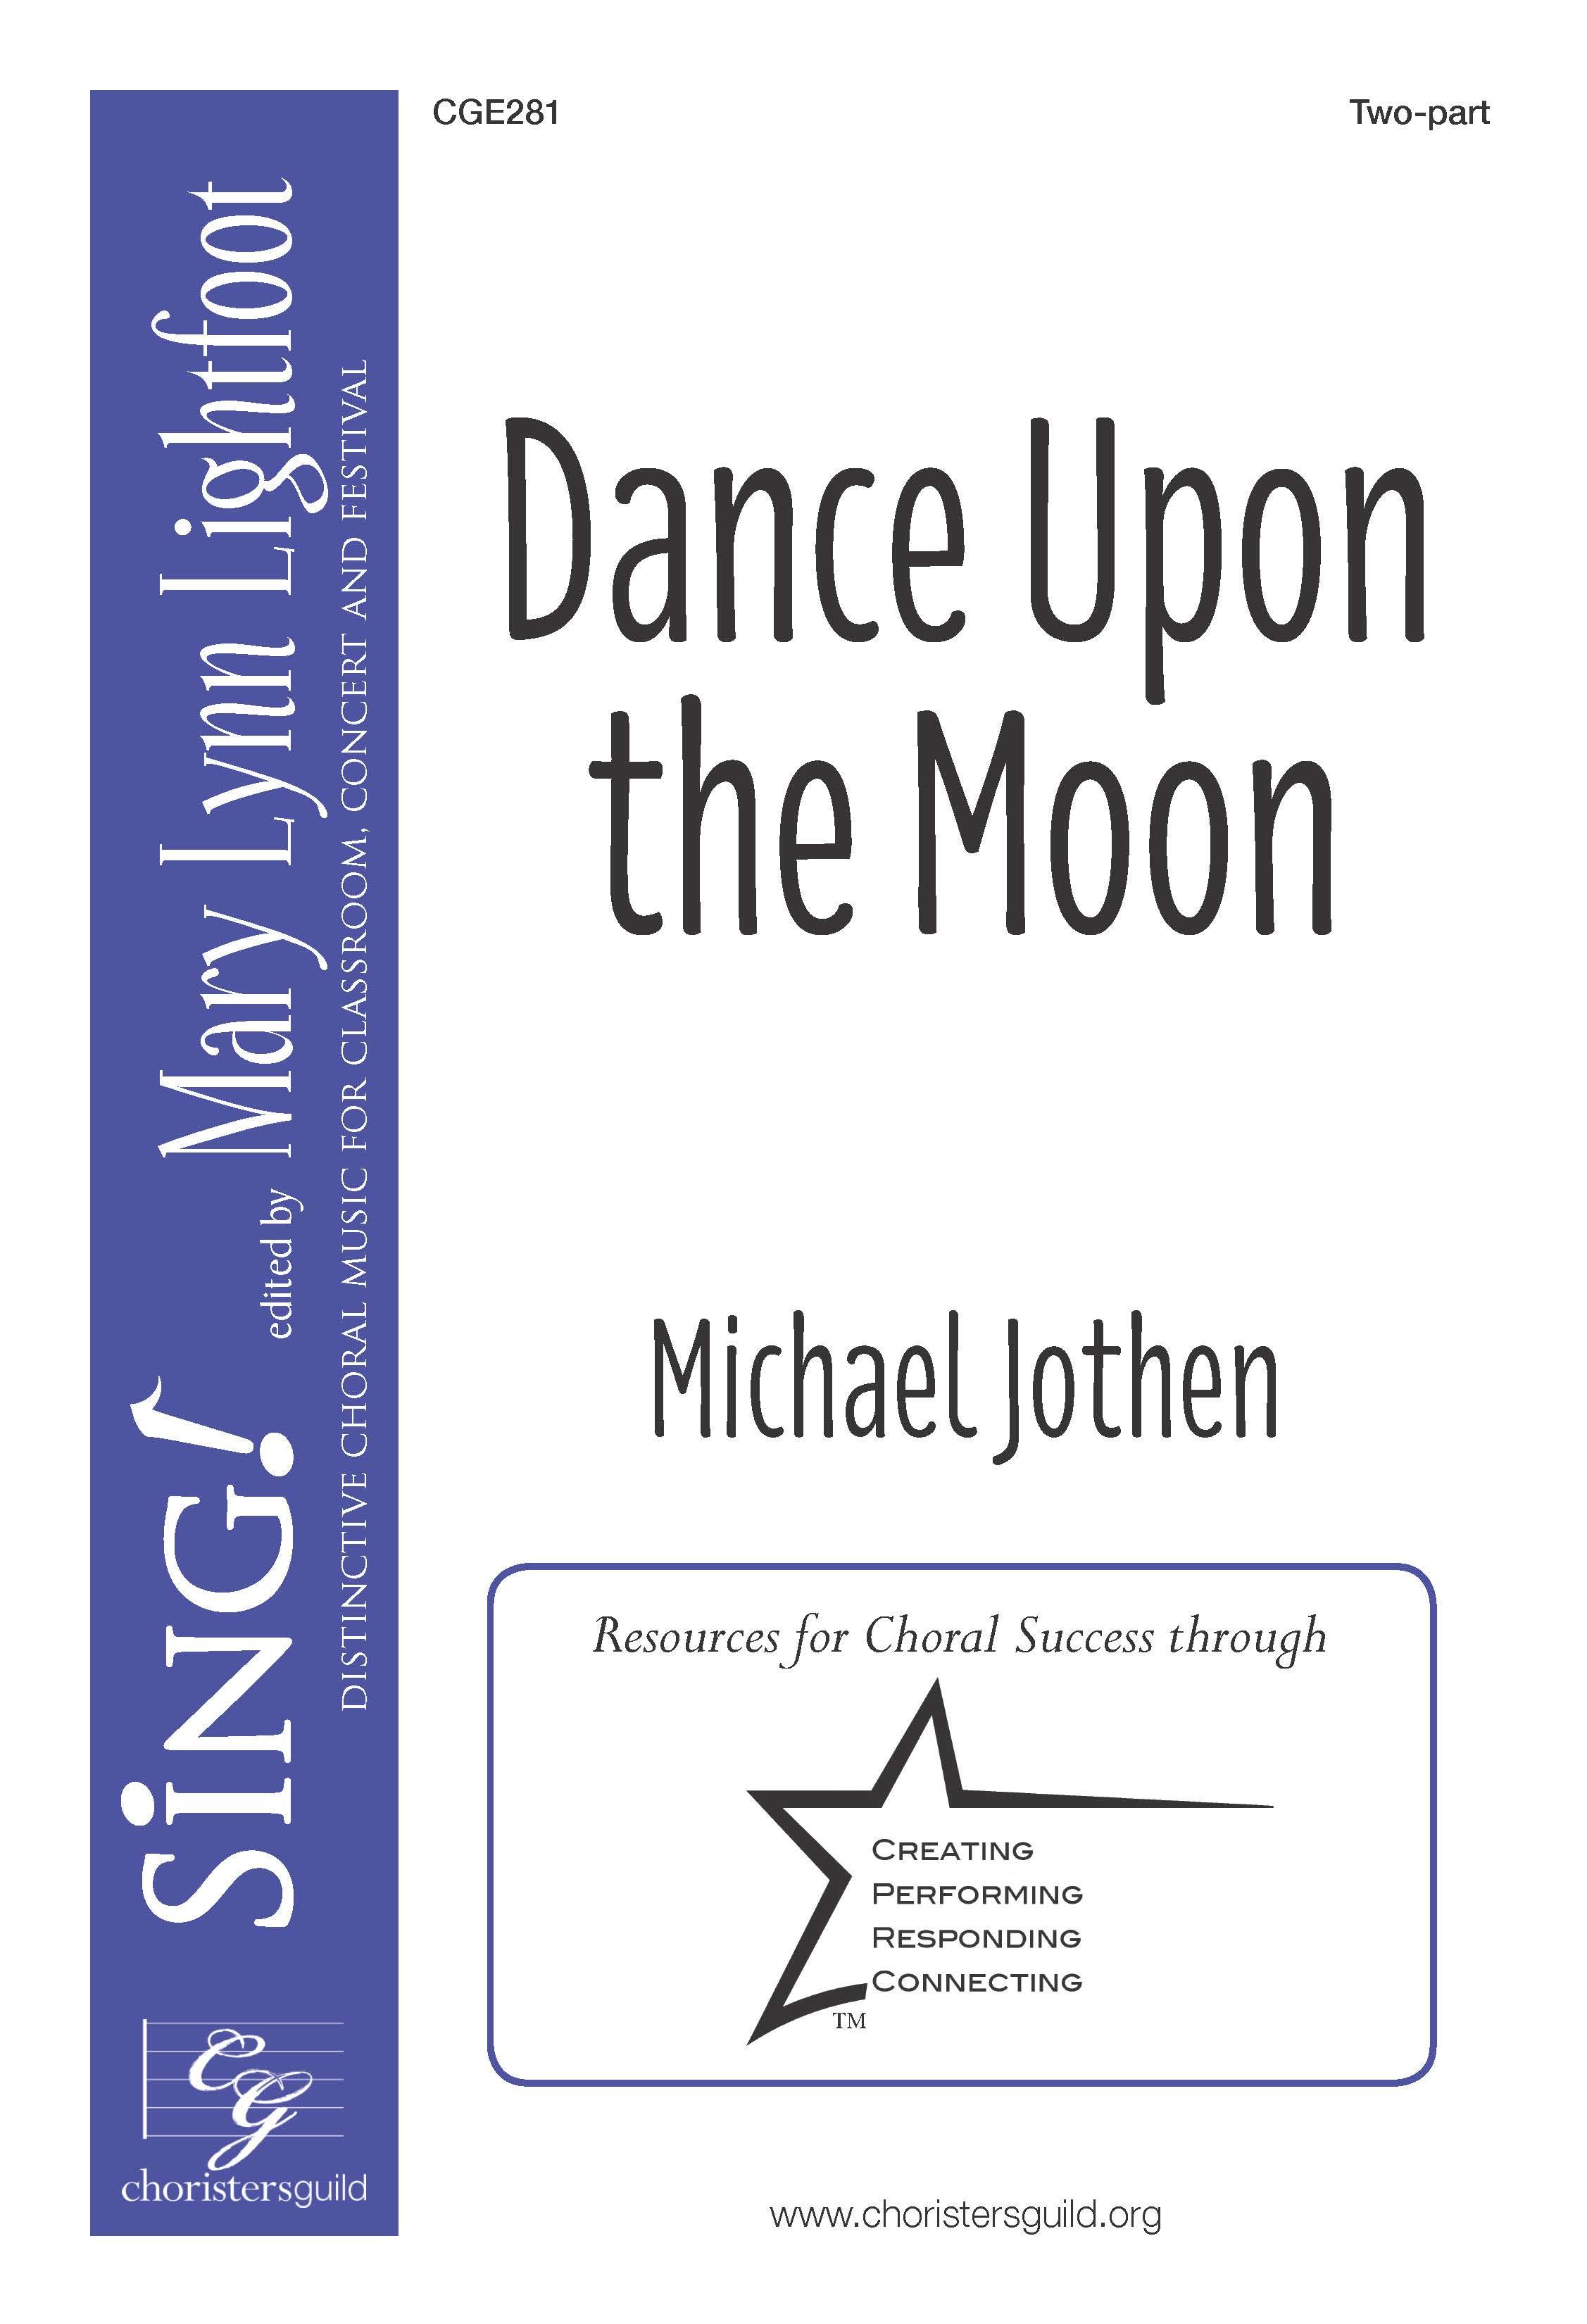 Dance Upon the Moon